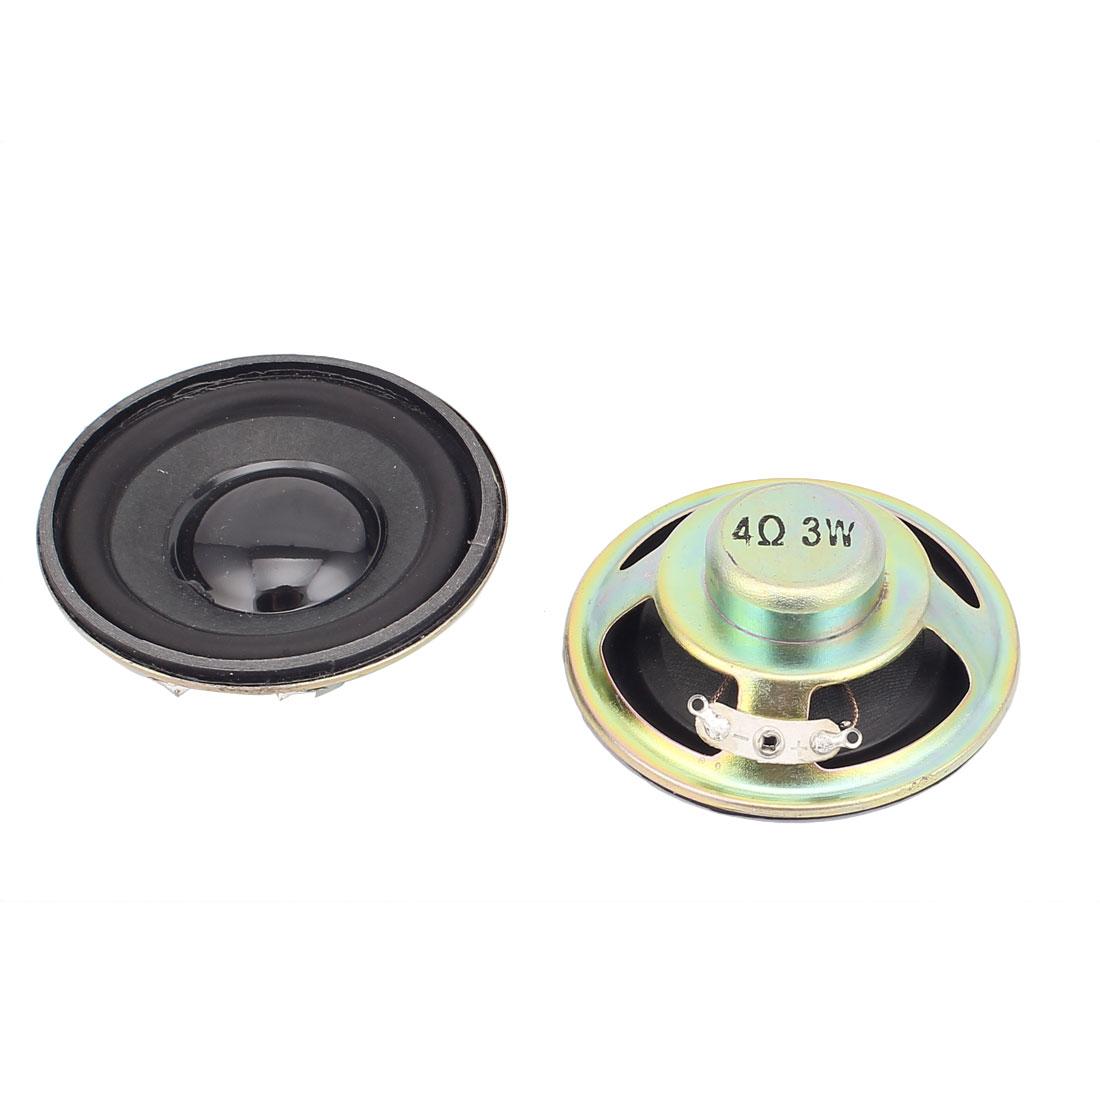 2 Pcs 57mm 4Ohm 3W Metal Shell External Magnetic Speaker Loudspeaker Black